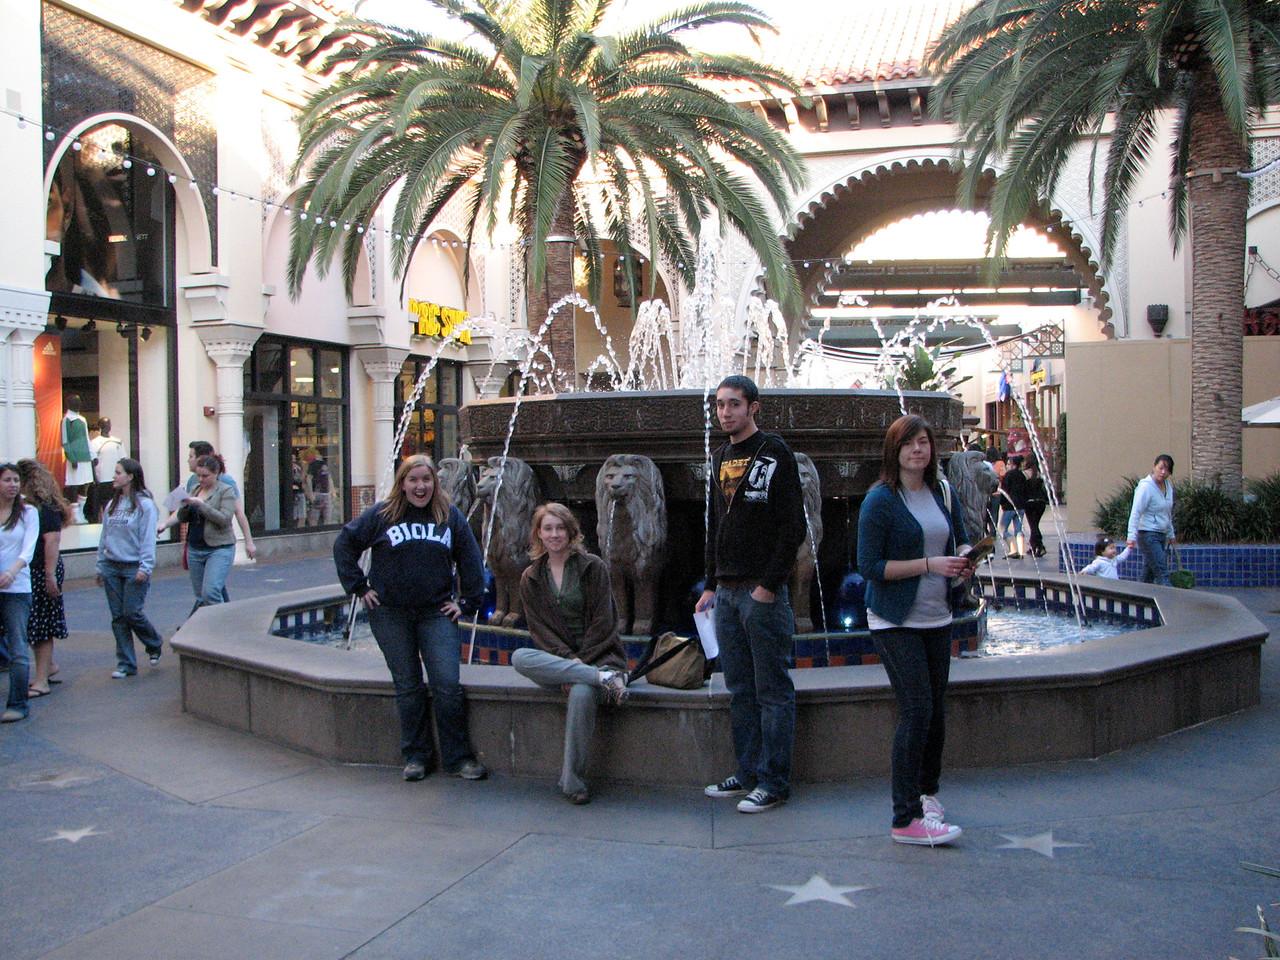 2007 03 02 Fri - Scavenger Hunt - Lions Fountain